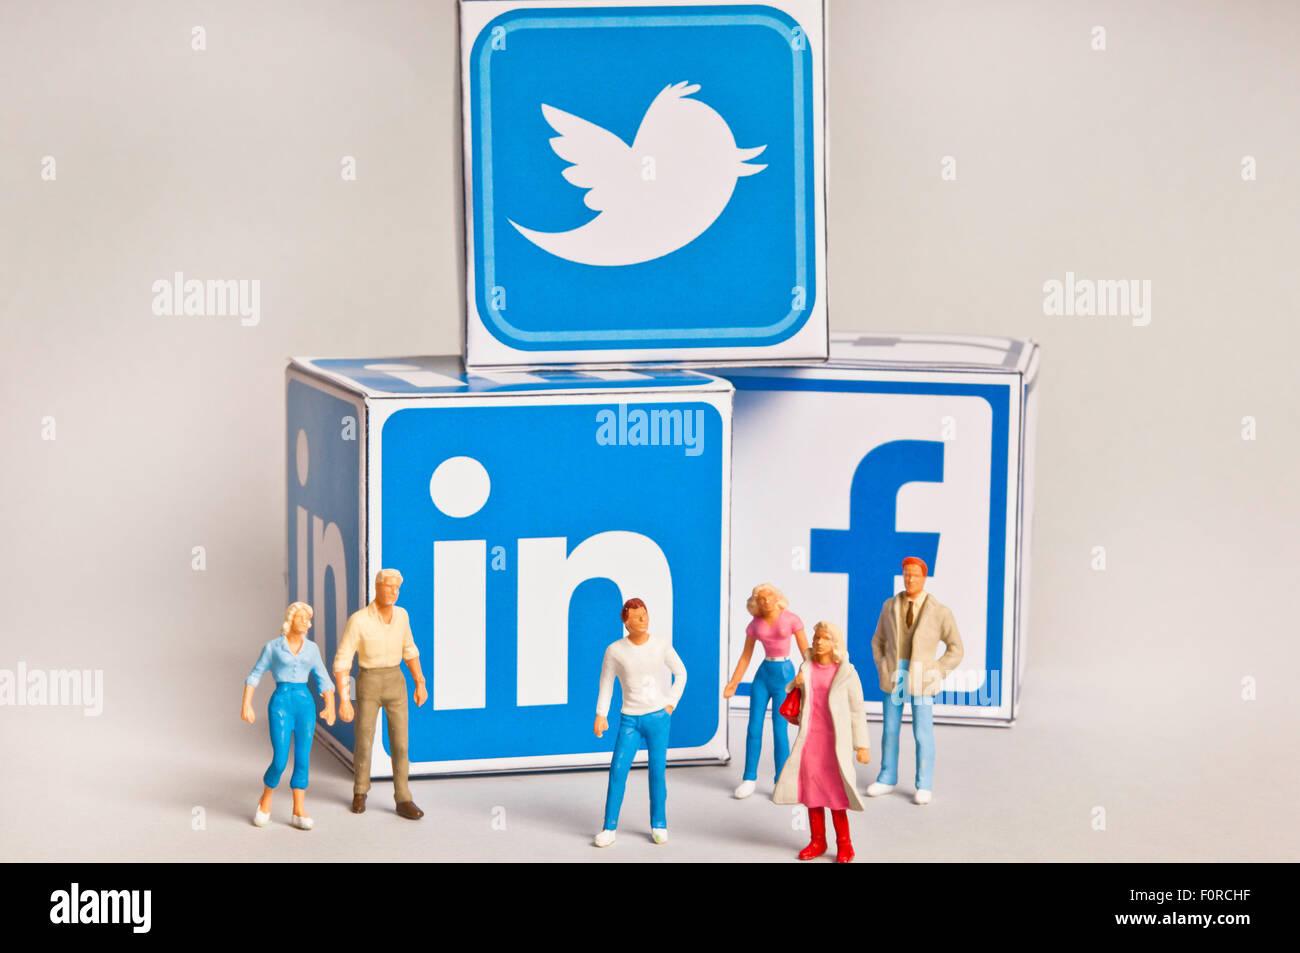 social media concept - Stock Image